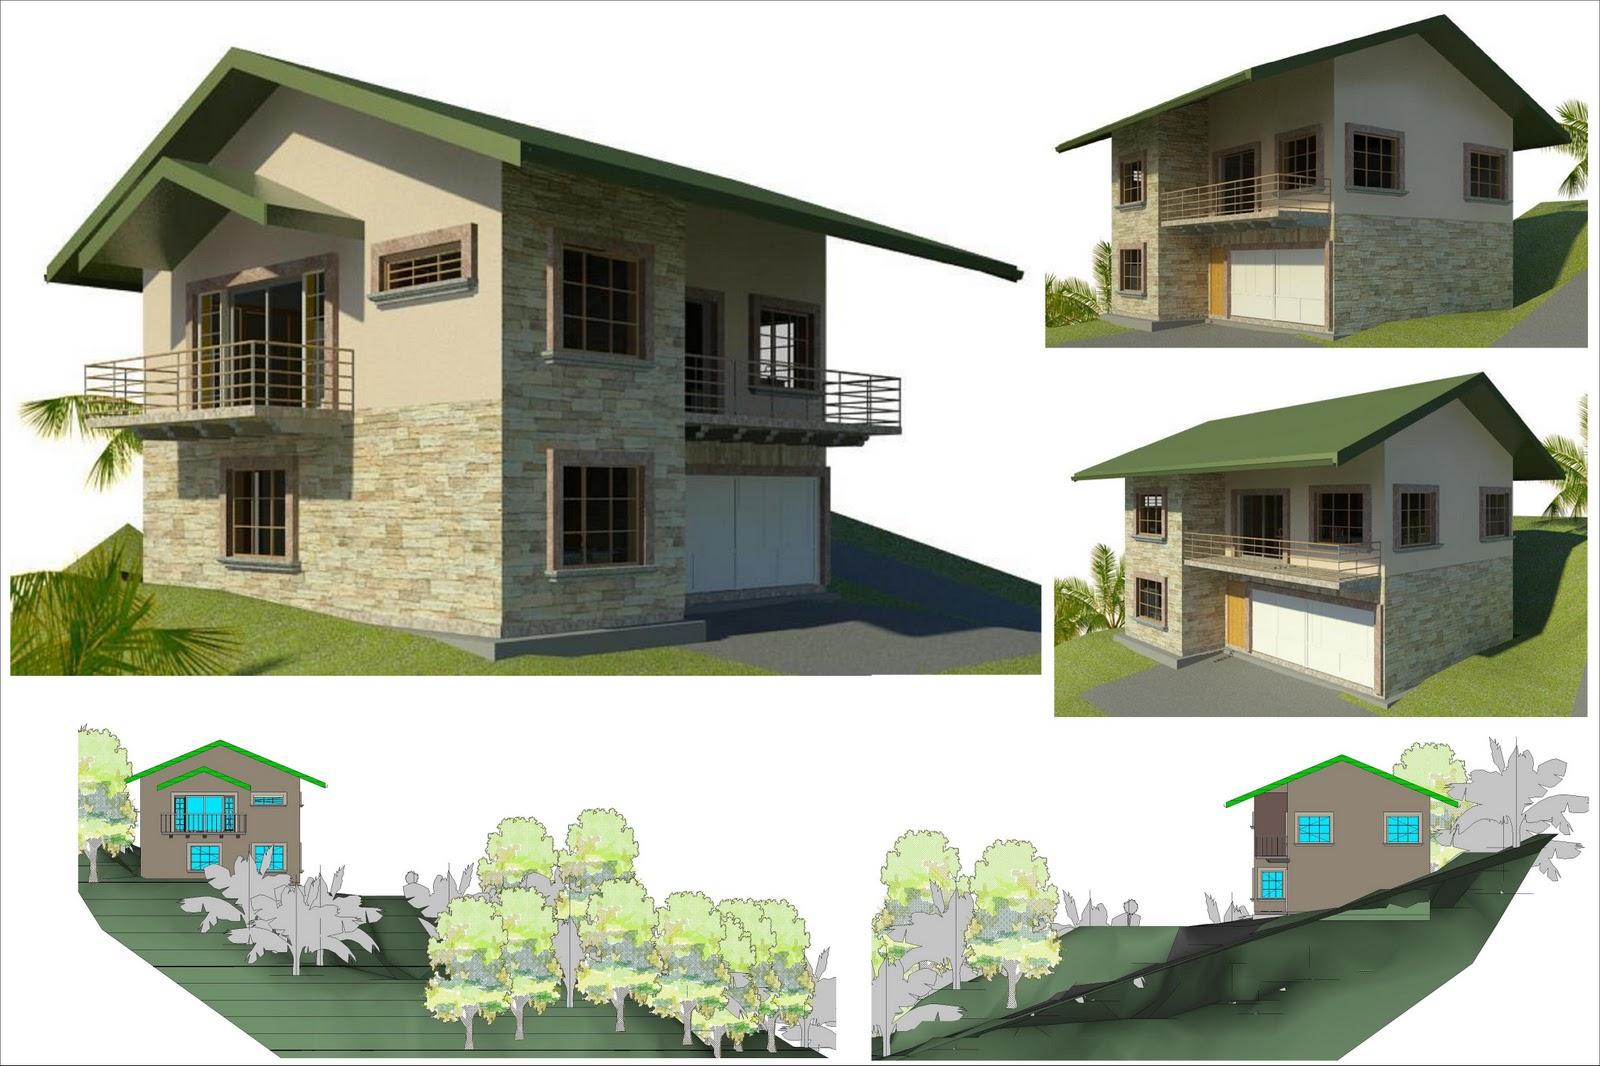 Arquitectura ingenieria proyecto casa habitaci n for Proyecto casa habitacion minimalista